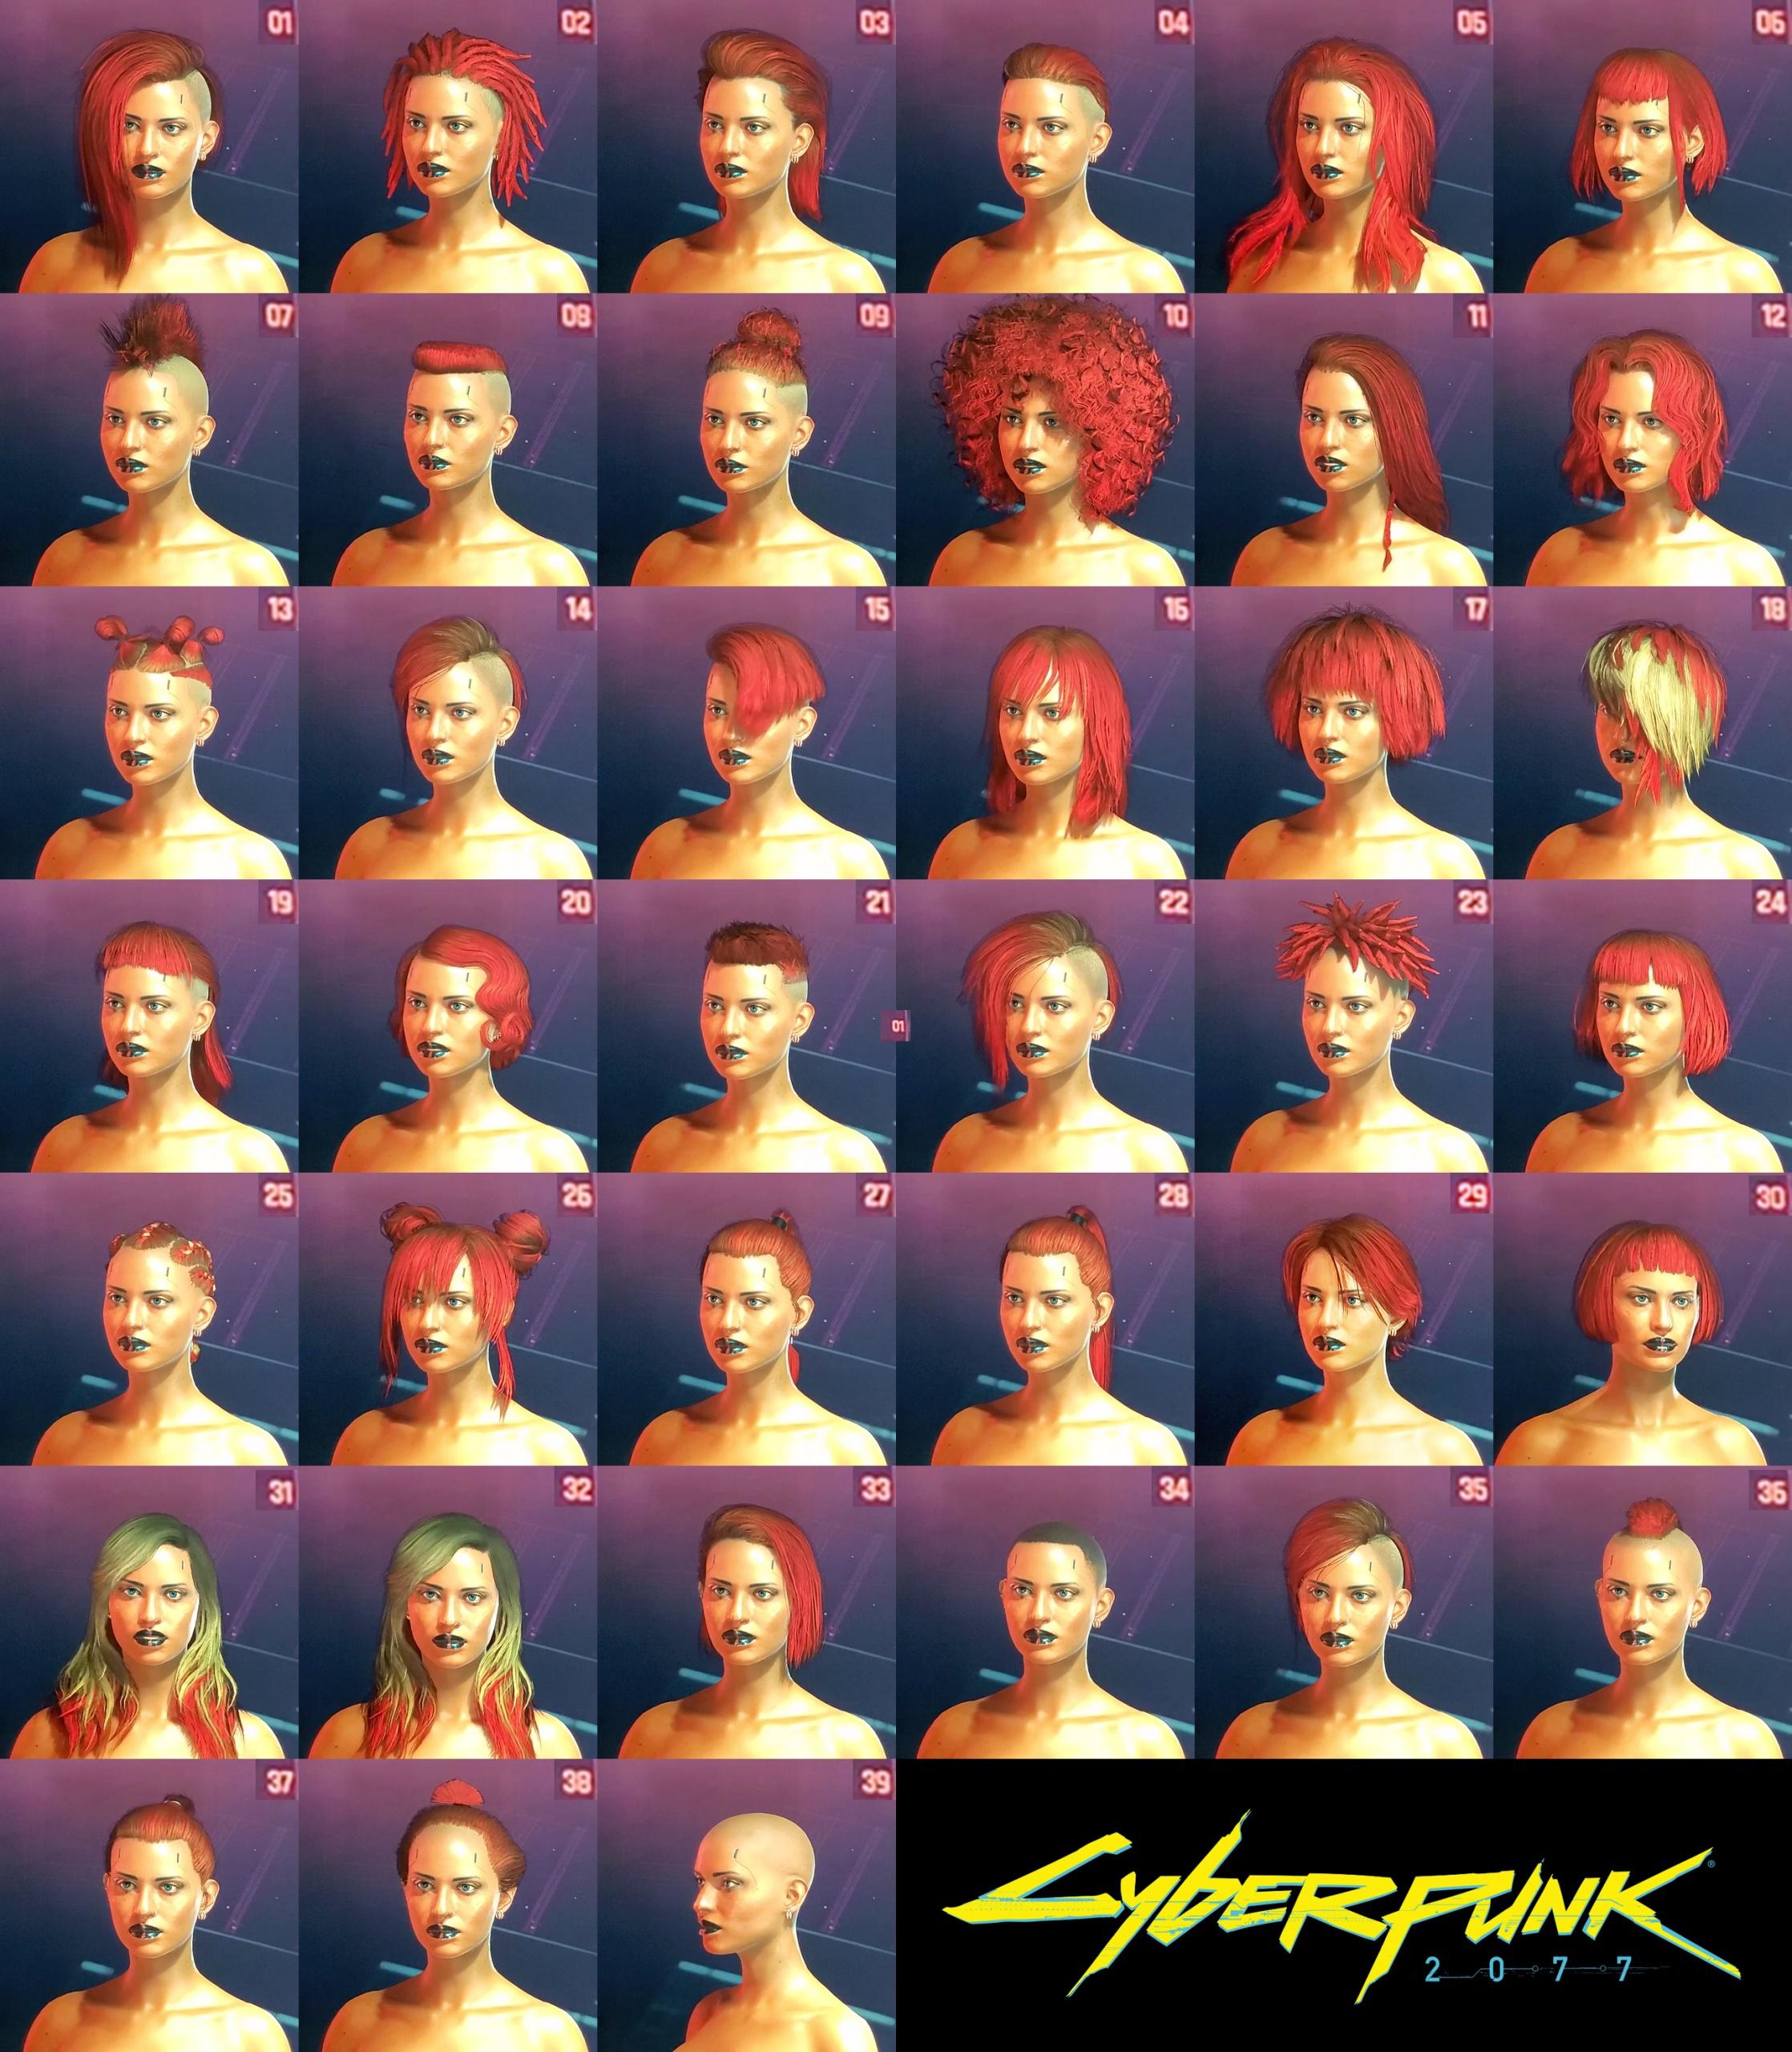 Cyberpunk 2077 Female Hairstyles